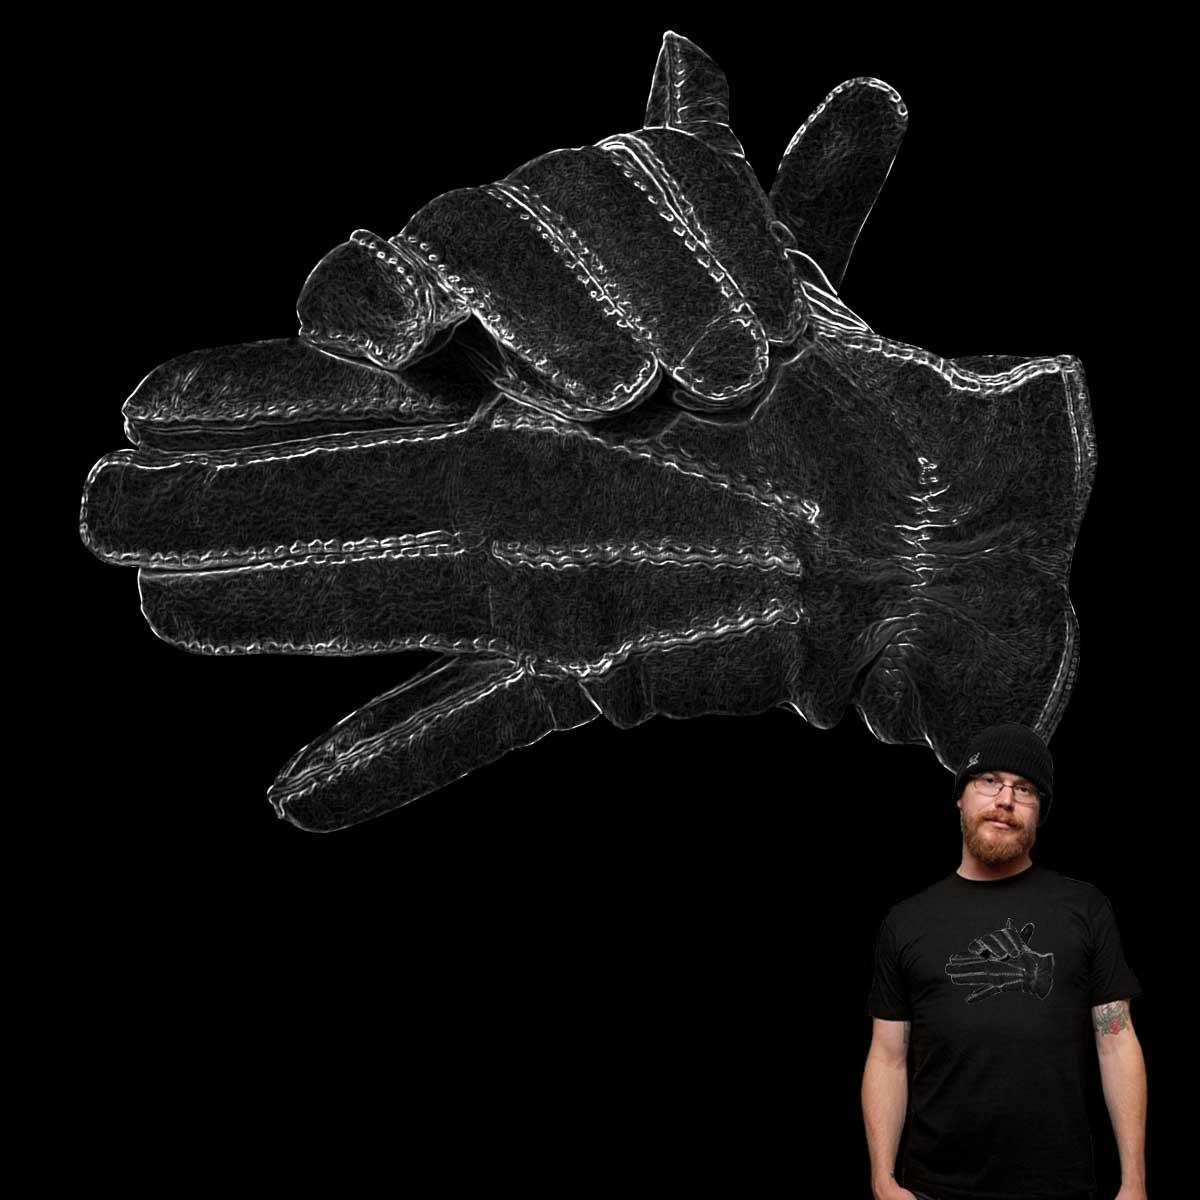 Dog Gloves by YaaH on Threadless